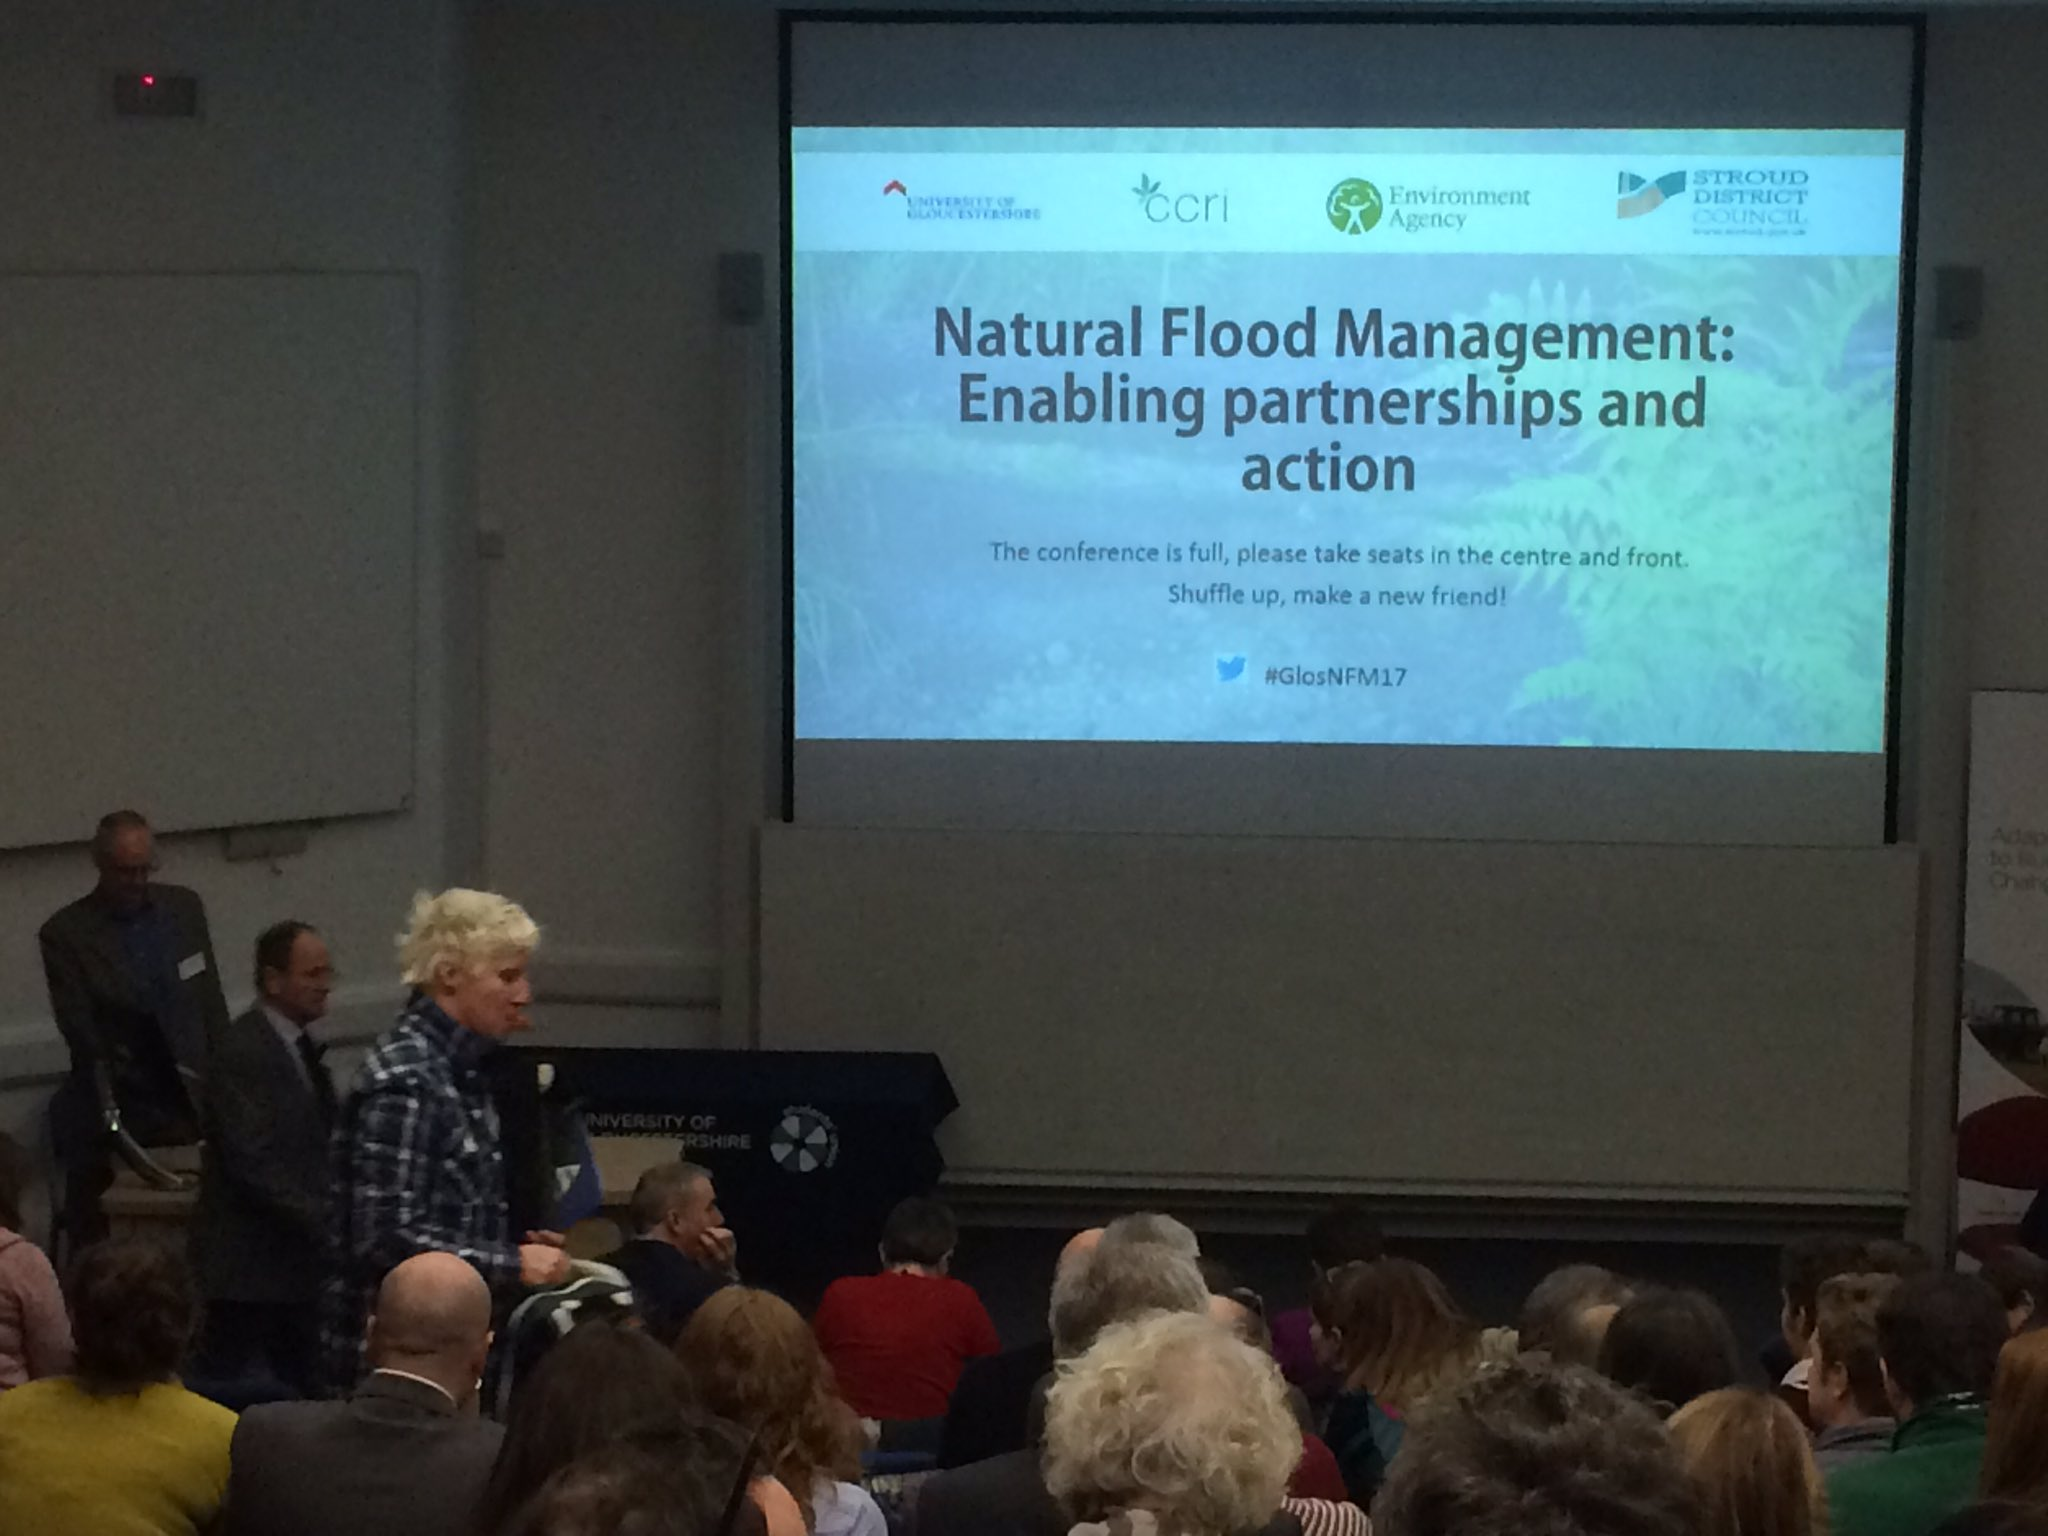 Full house of 200 delegates for start of Natural Flood Management Conference at @uniofglos #GlosNFM17 @CCRI_UK https://t.co/5gv4gaOhkg